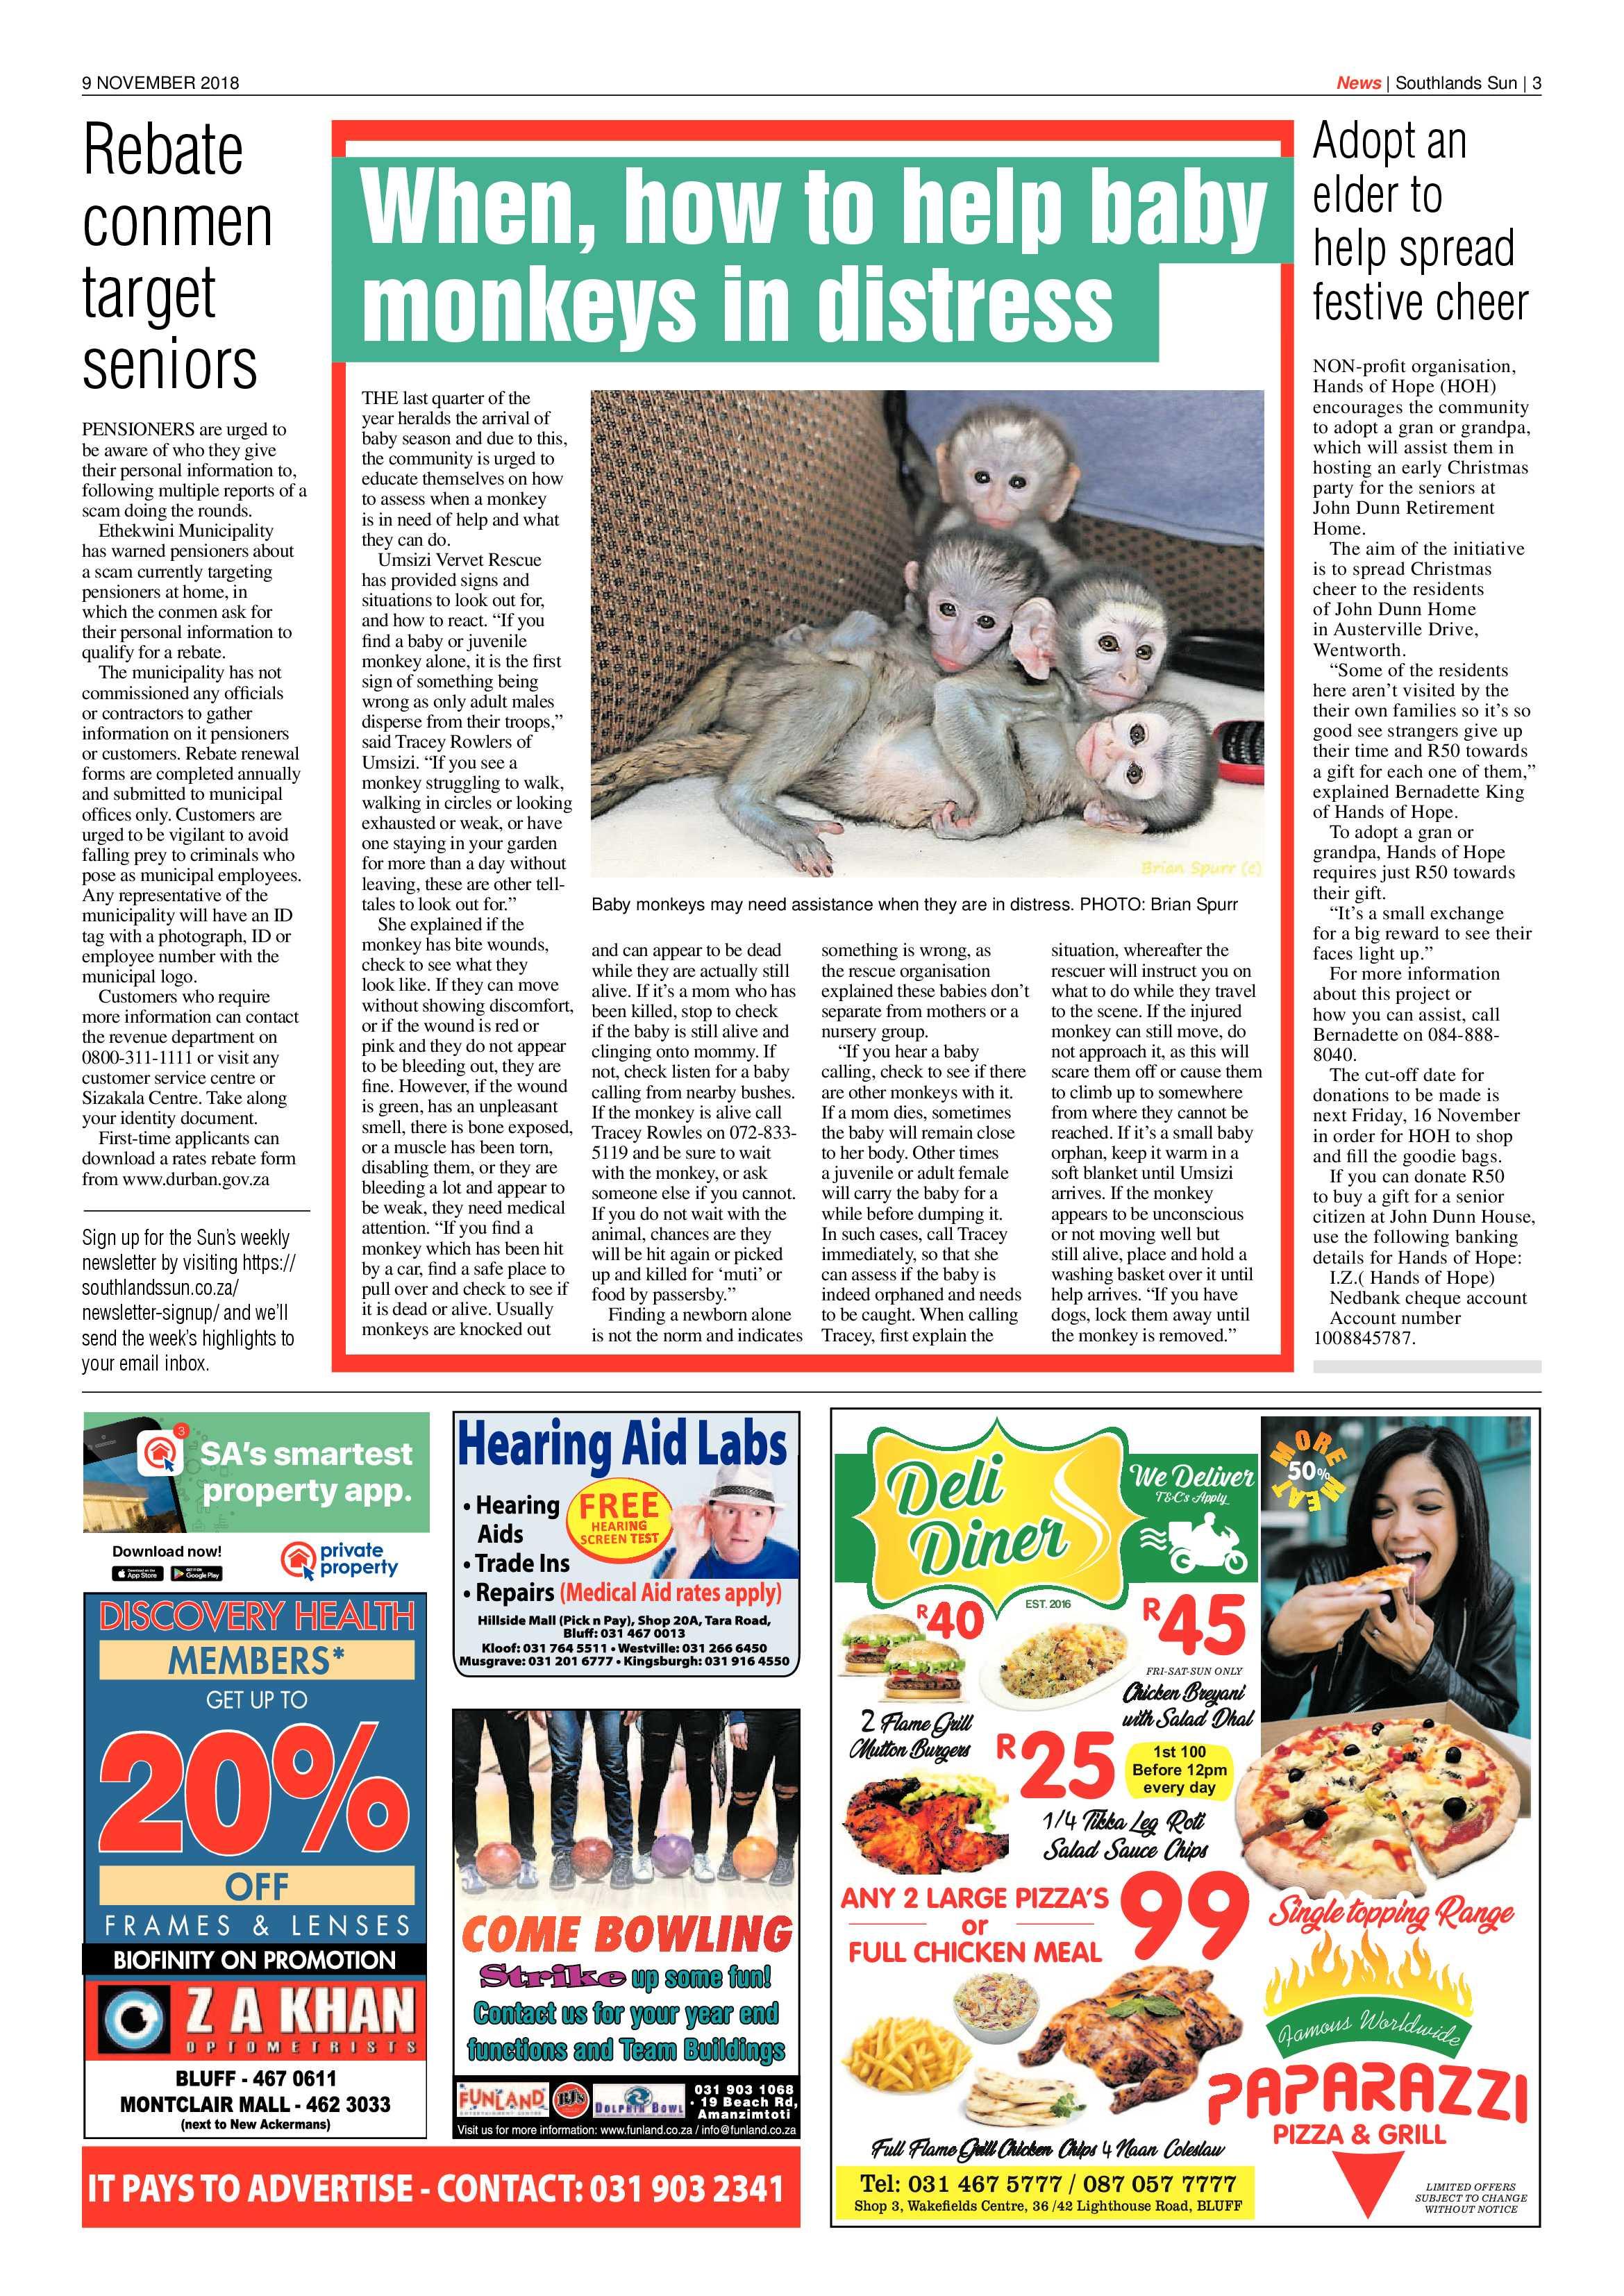 9-november-2018-epapers-page-3